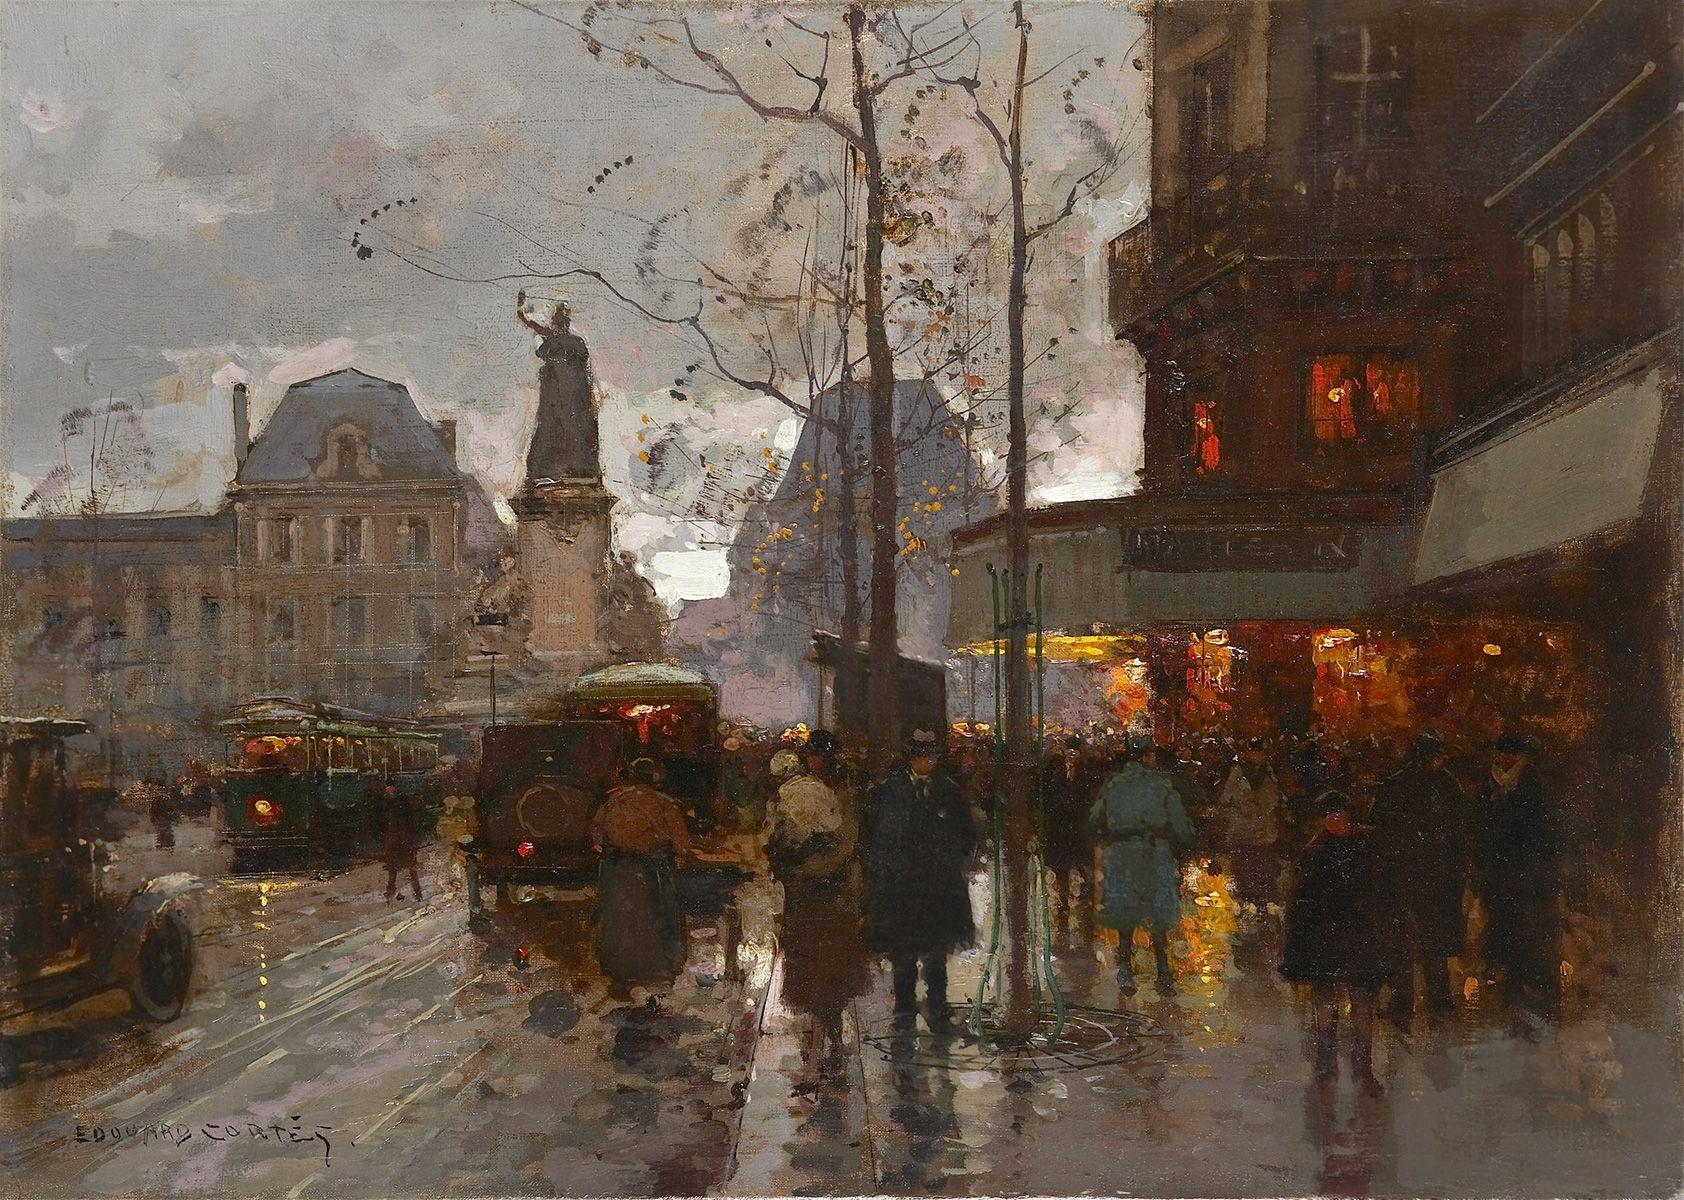 Extrêmement Édouard Cortès - Galerie Ary Jan IZ49